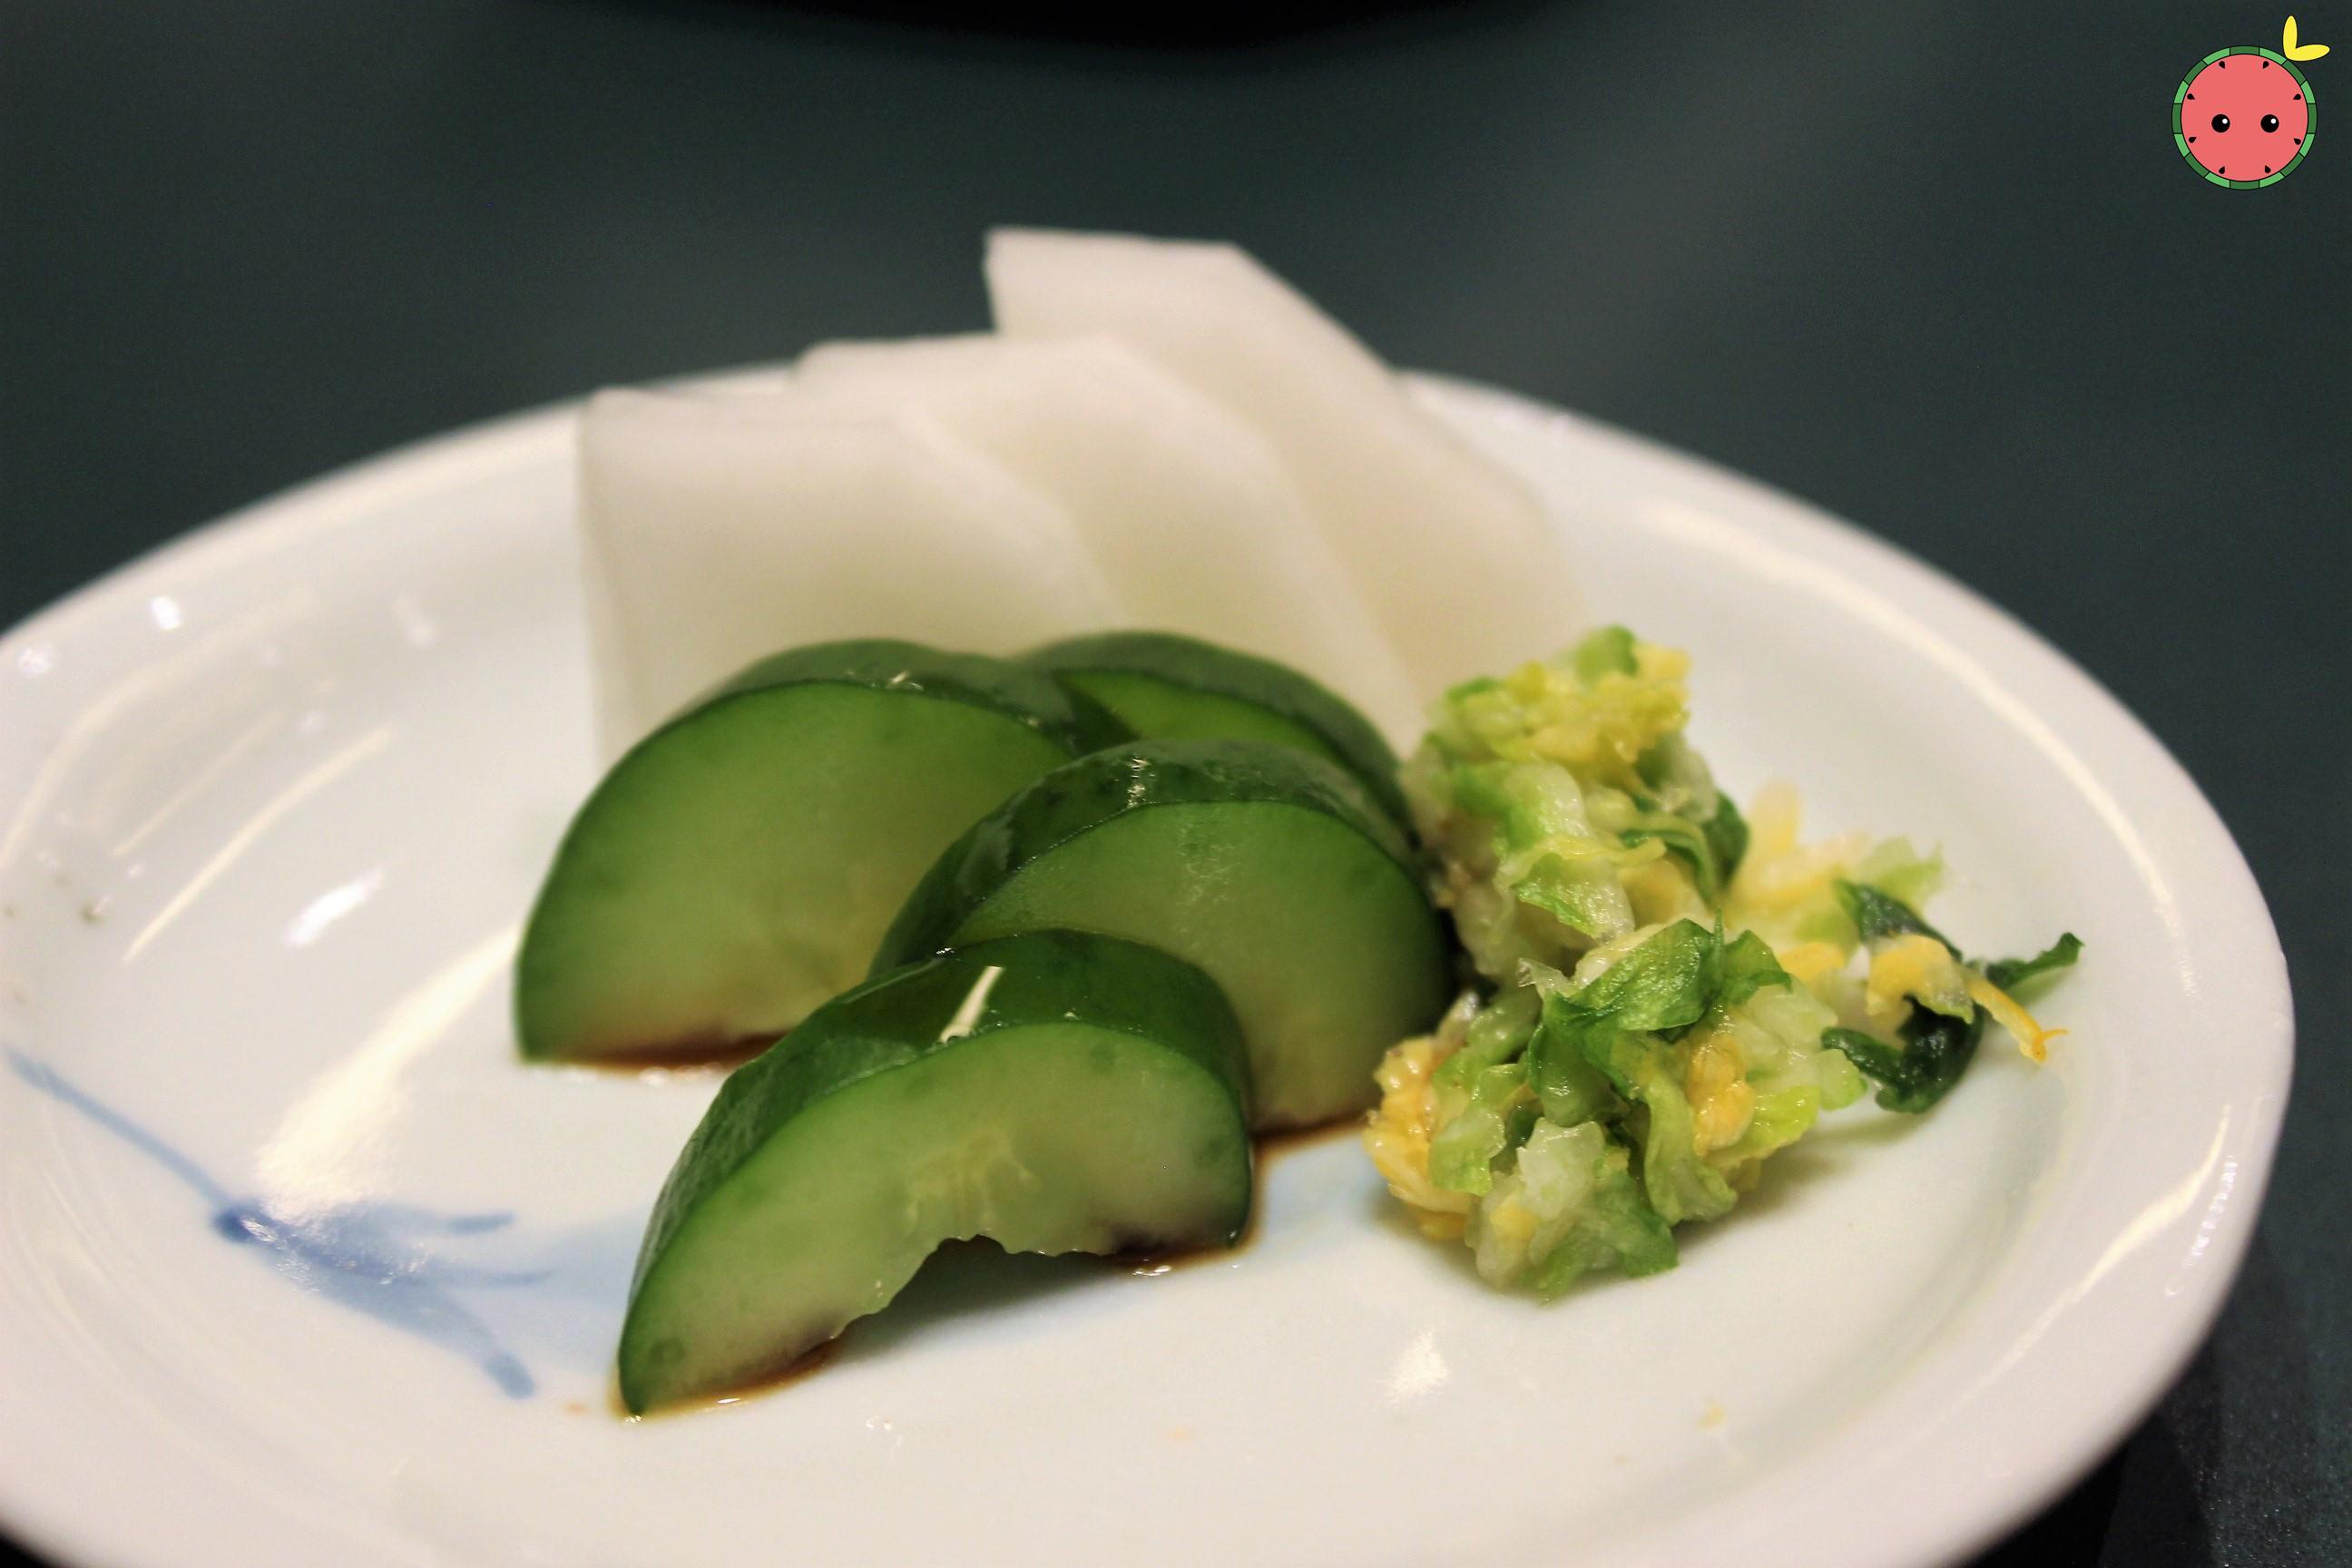 Pickled Veggies